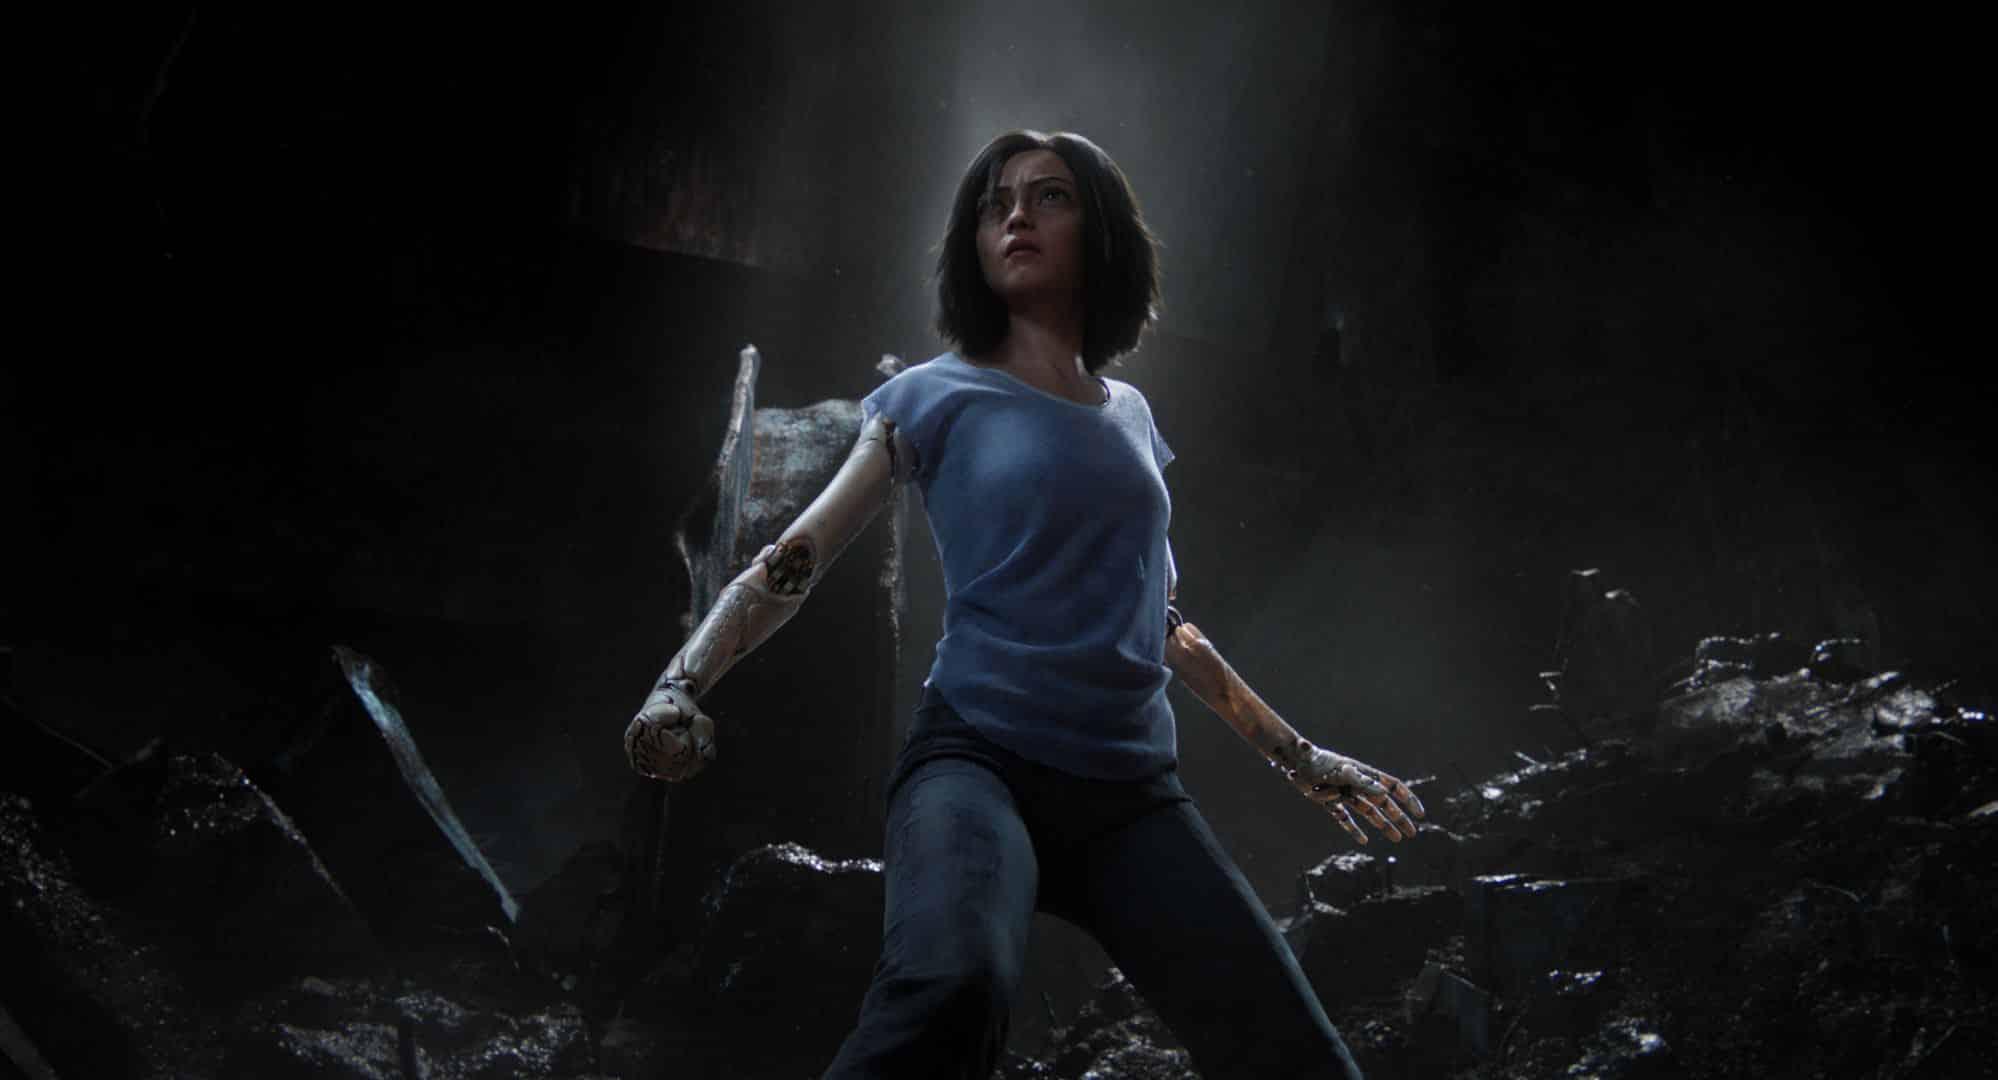 Rosa Salazar is Alita in Alita: Battle Angel